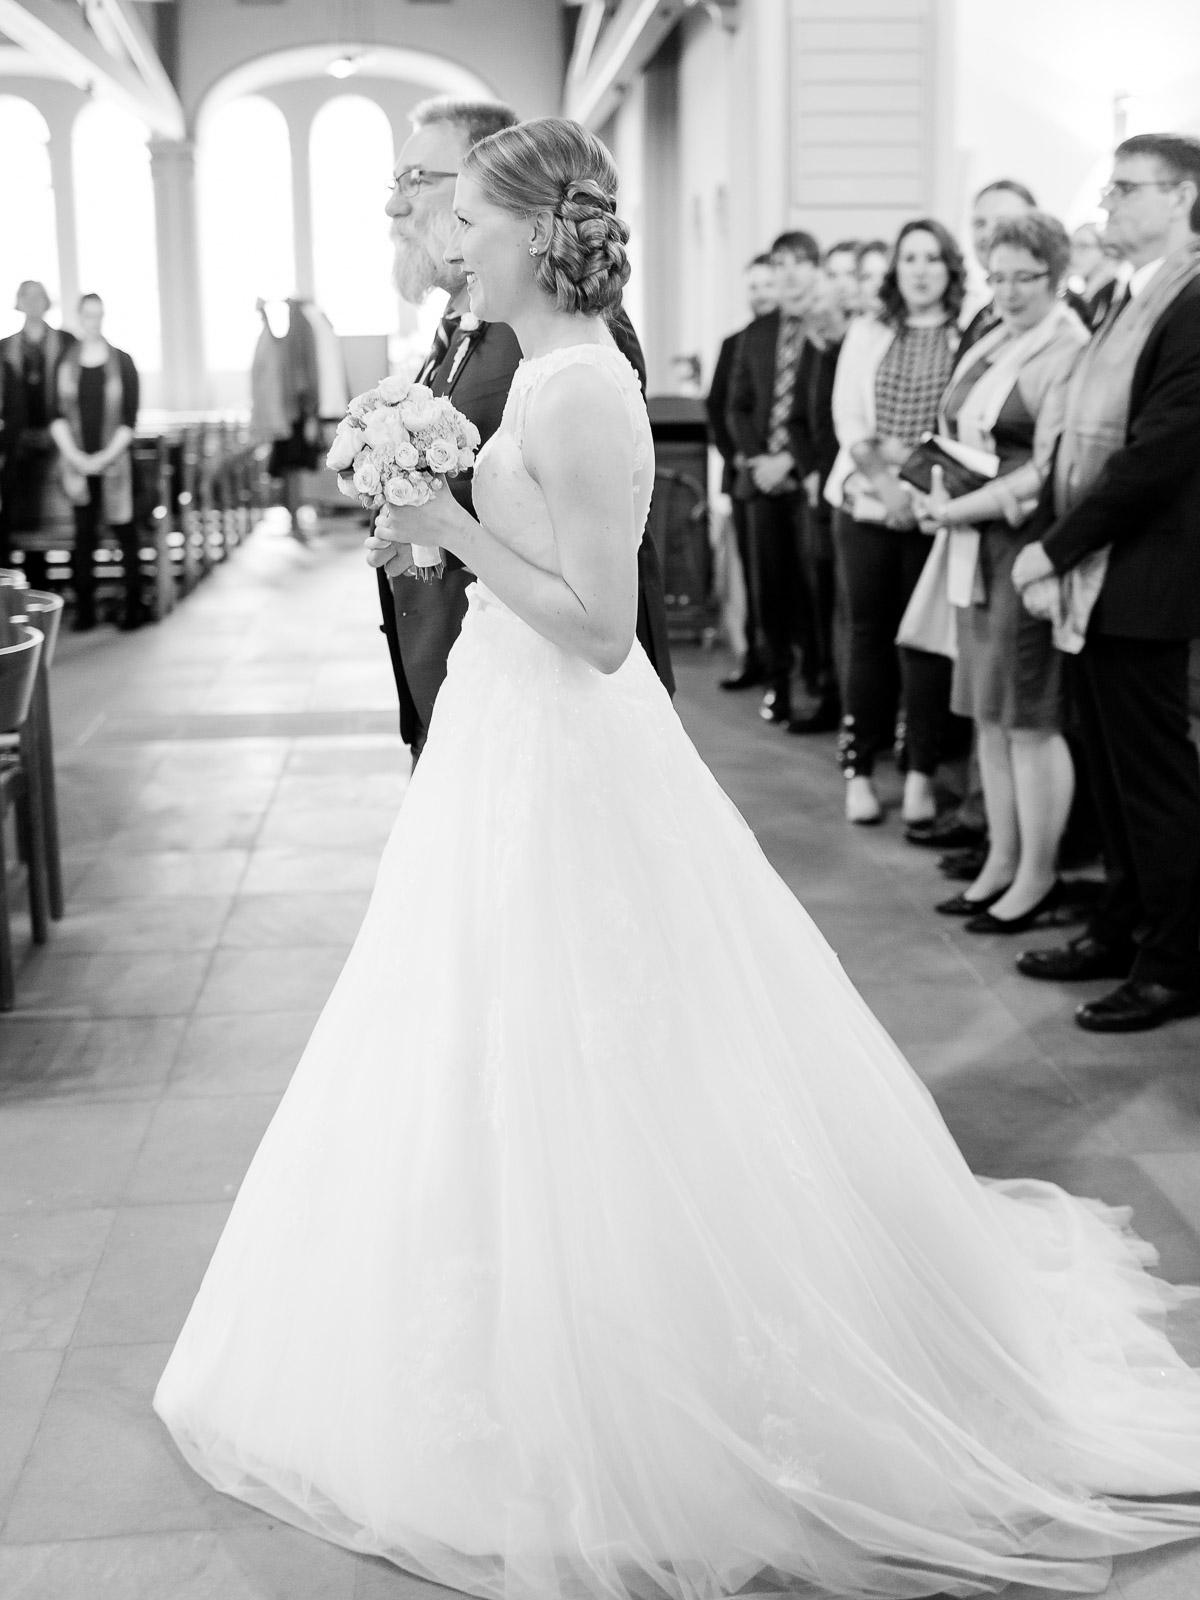 Hochzeitsfotograf-Bielefeld-2016-04-23040